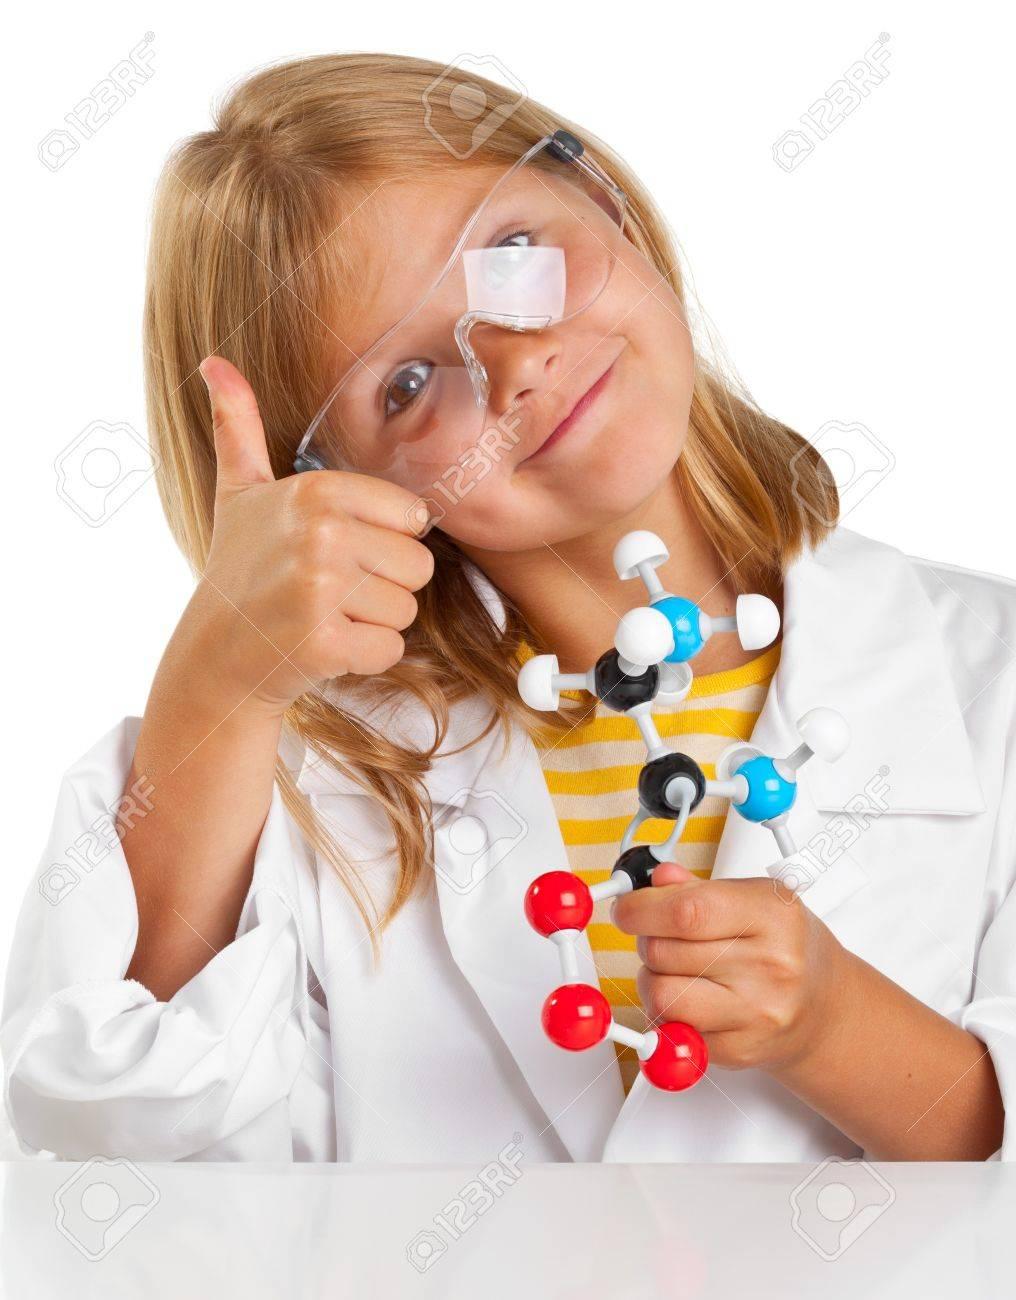 Cute young girl doing science experiements Standard-Bild - 14615541